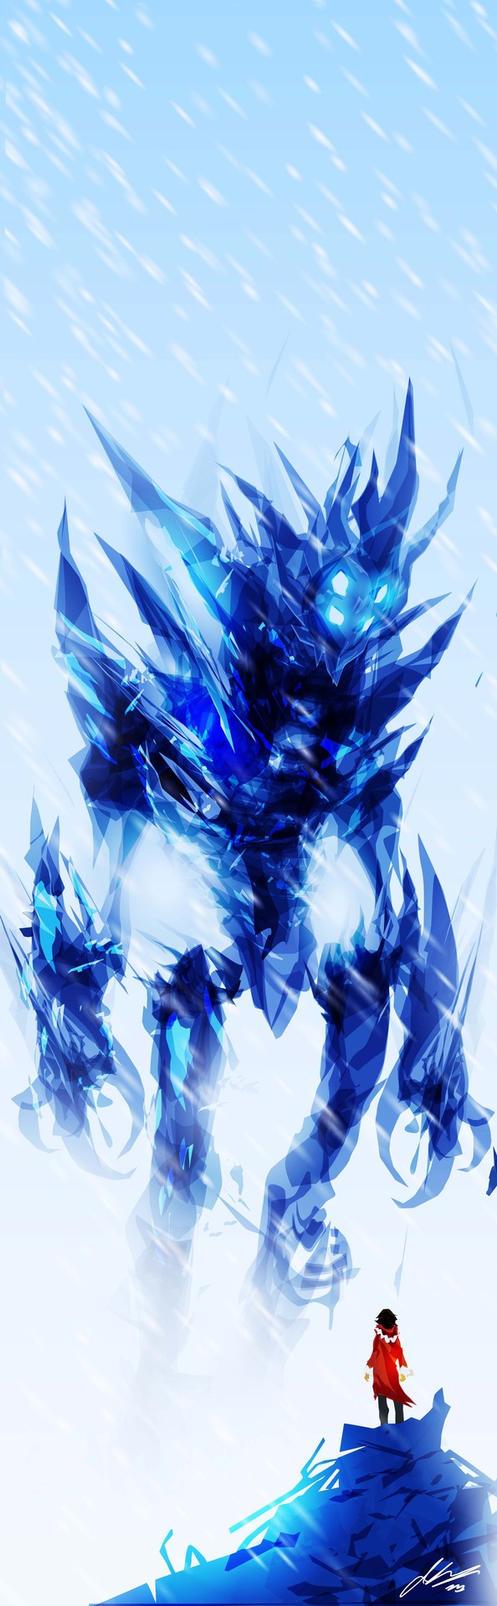 Ice Titan Speedpaint by ChasingArtwork